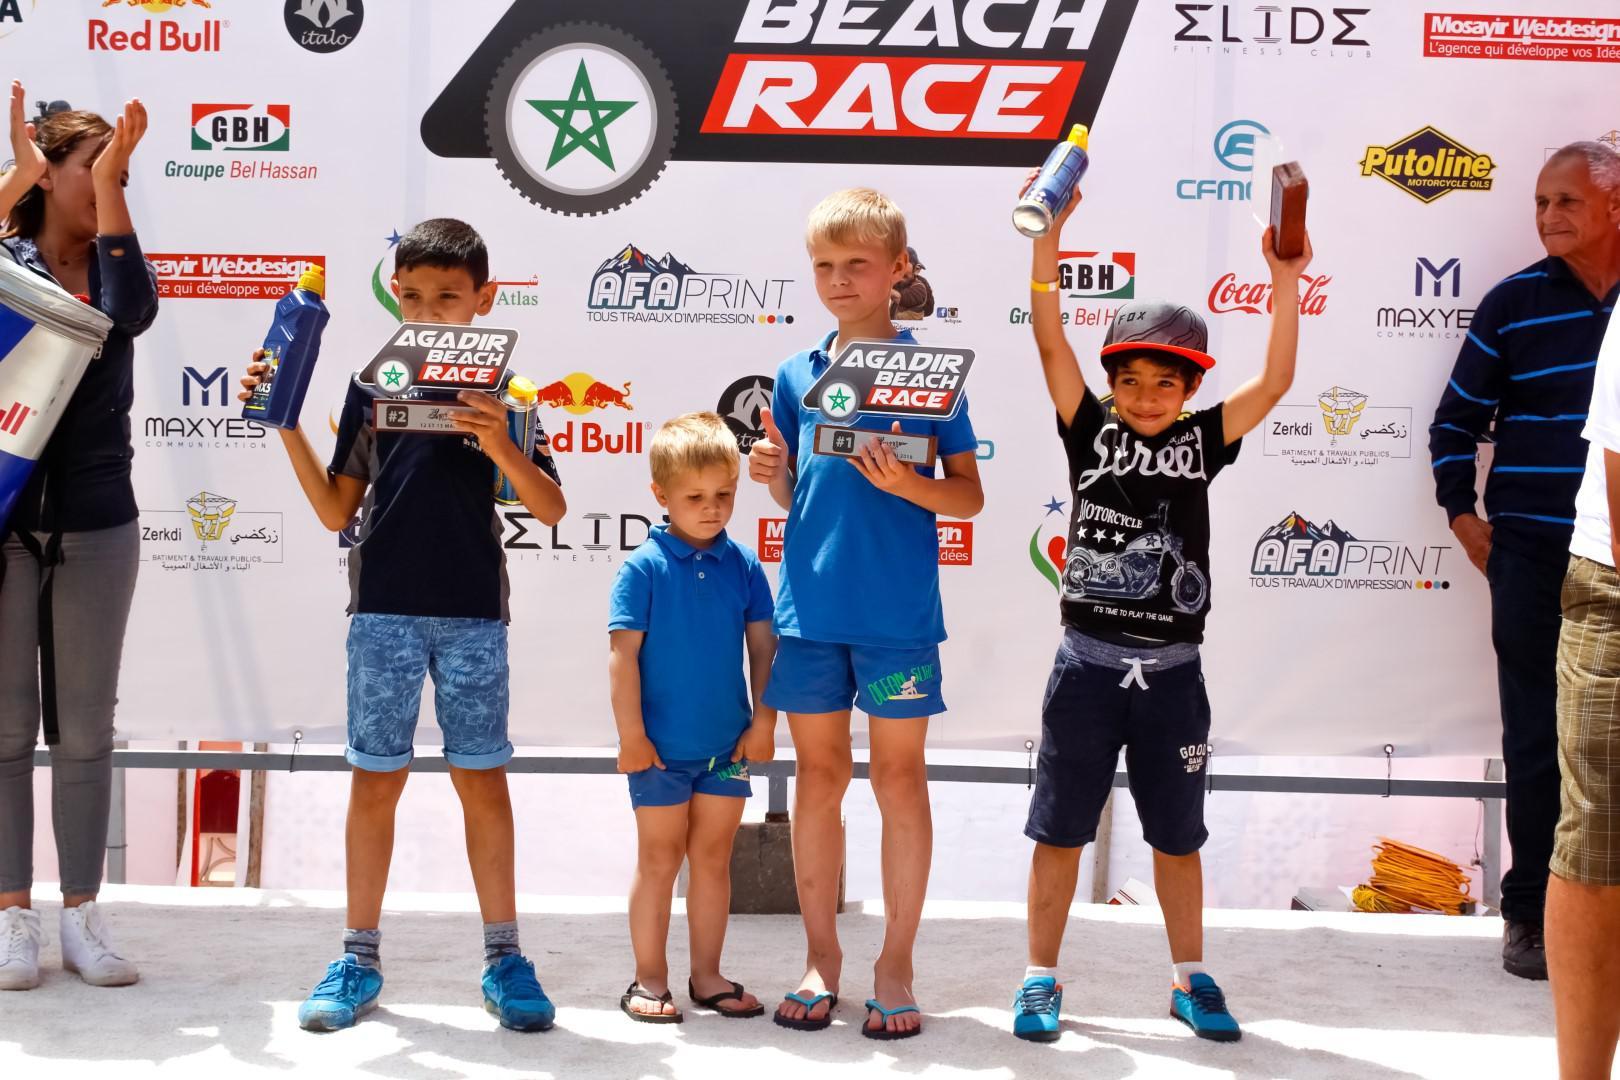 agadir-beach-race-la-reussite-791-15.jpg